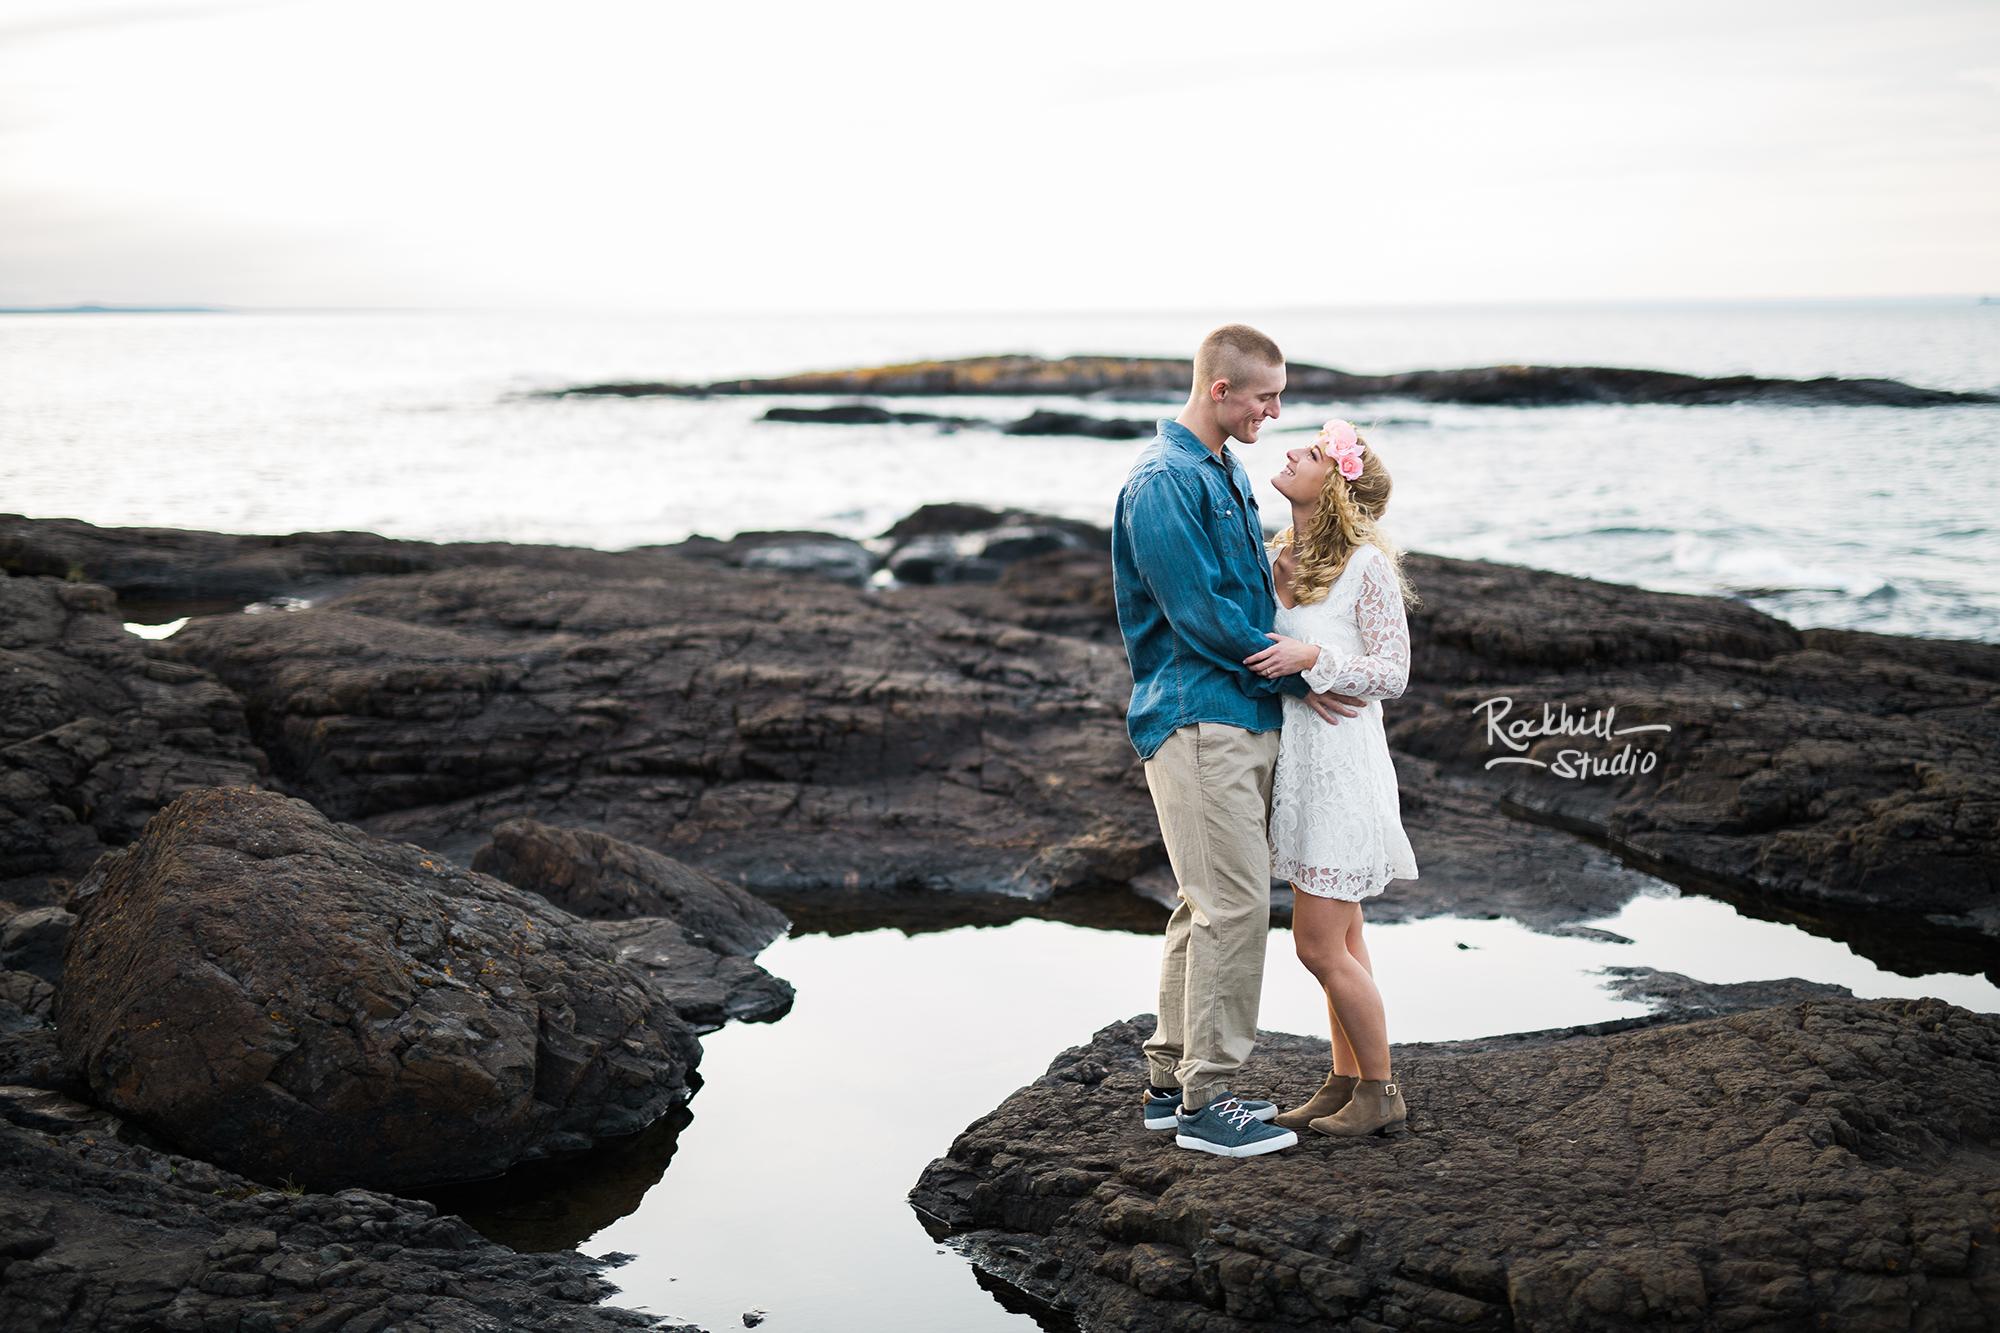 marquette-michigan-wedding-photography-rockhill-presque-isle-upper-peninsula-michigan-haley-35.jpg